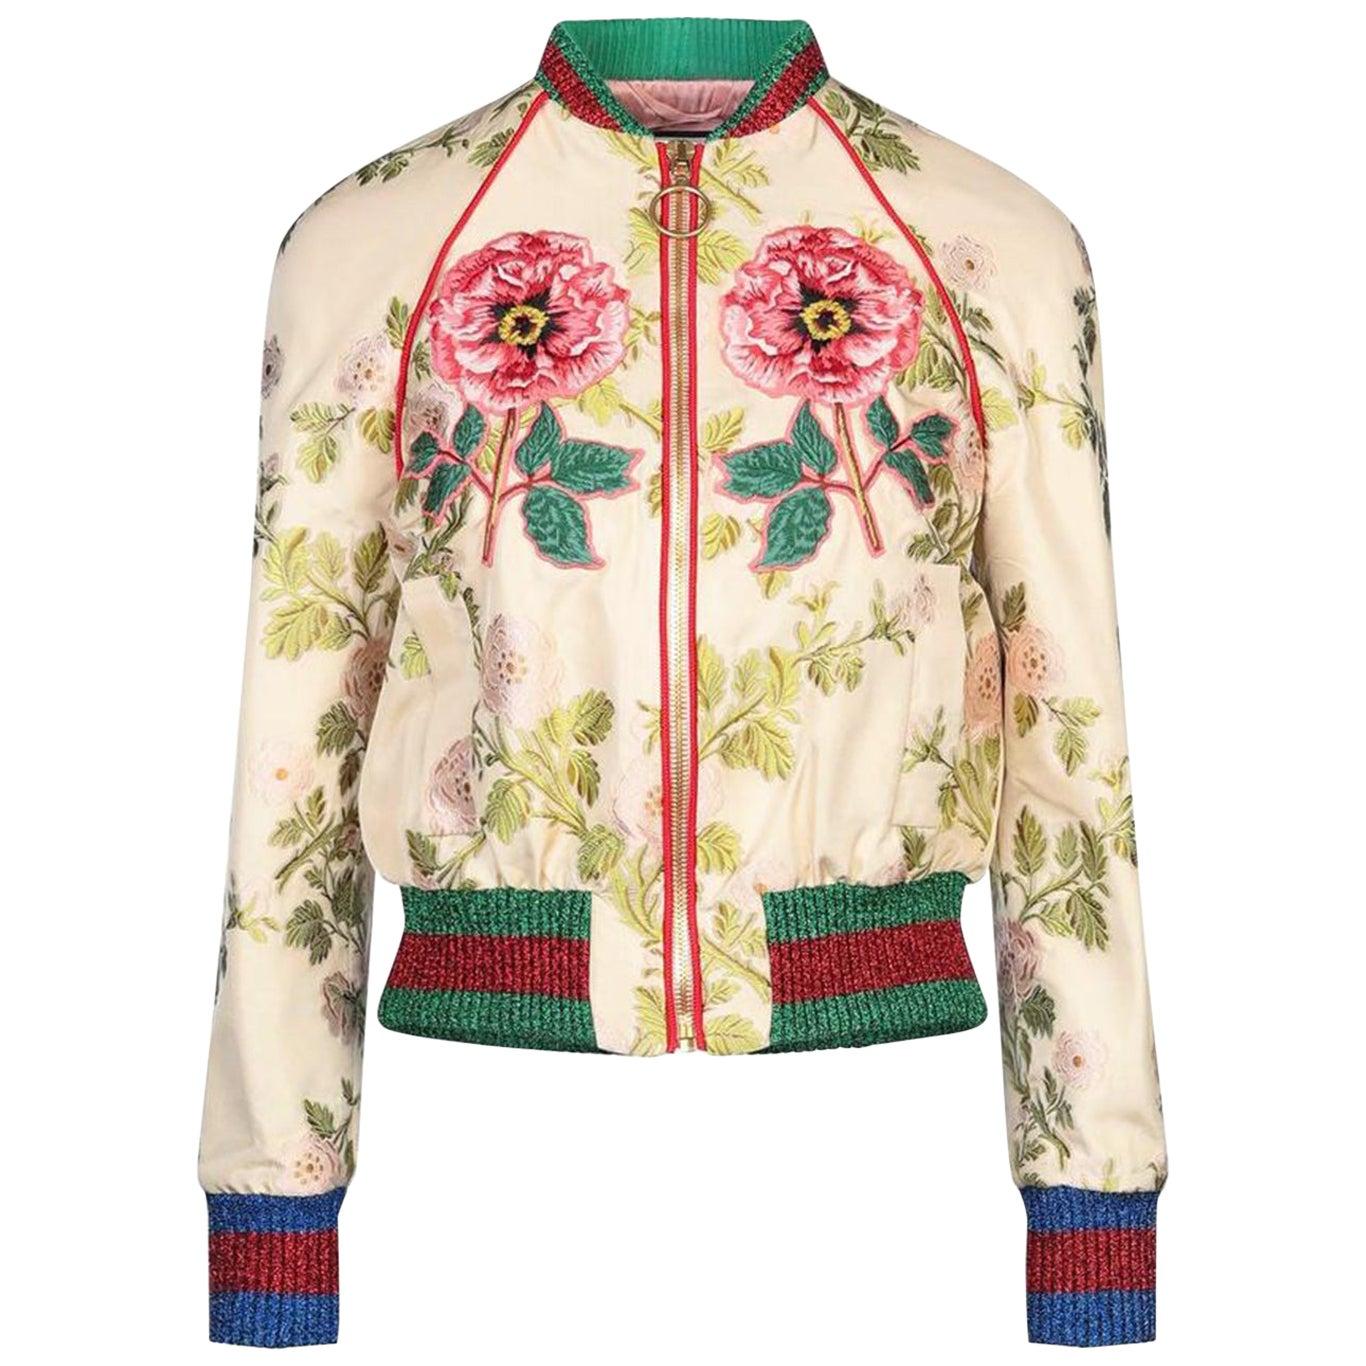 Gucci Appliquéd Floral Brocade Bomber Jacket